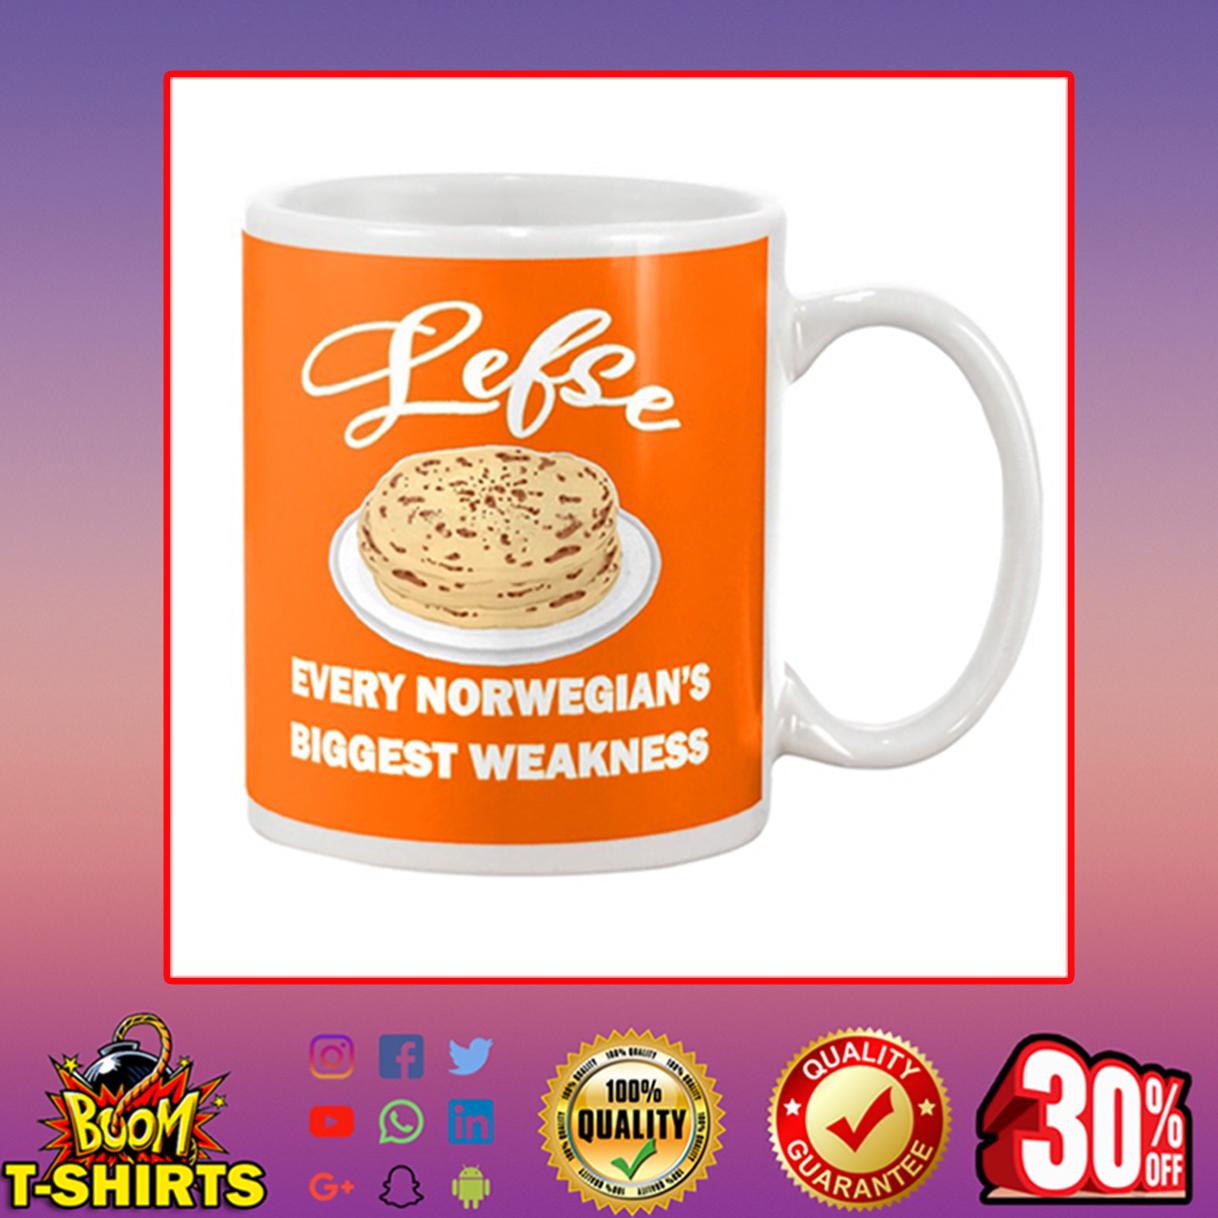 Lefse every norwegian's biggest weakness mug - orange